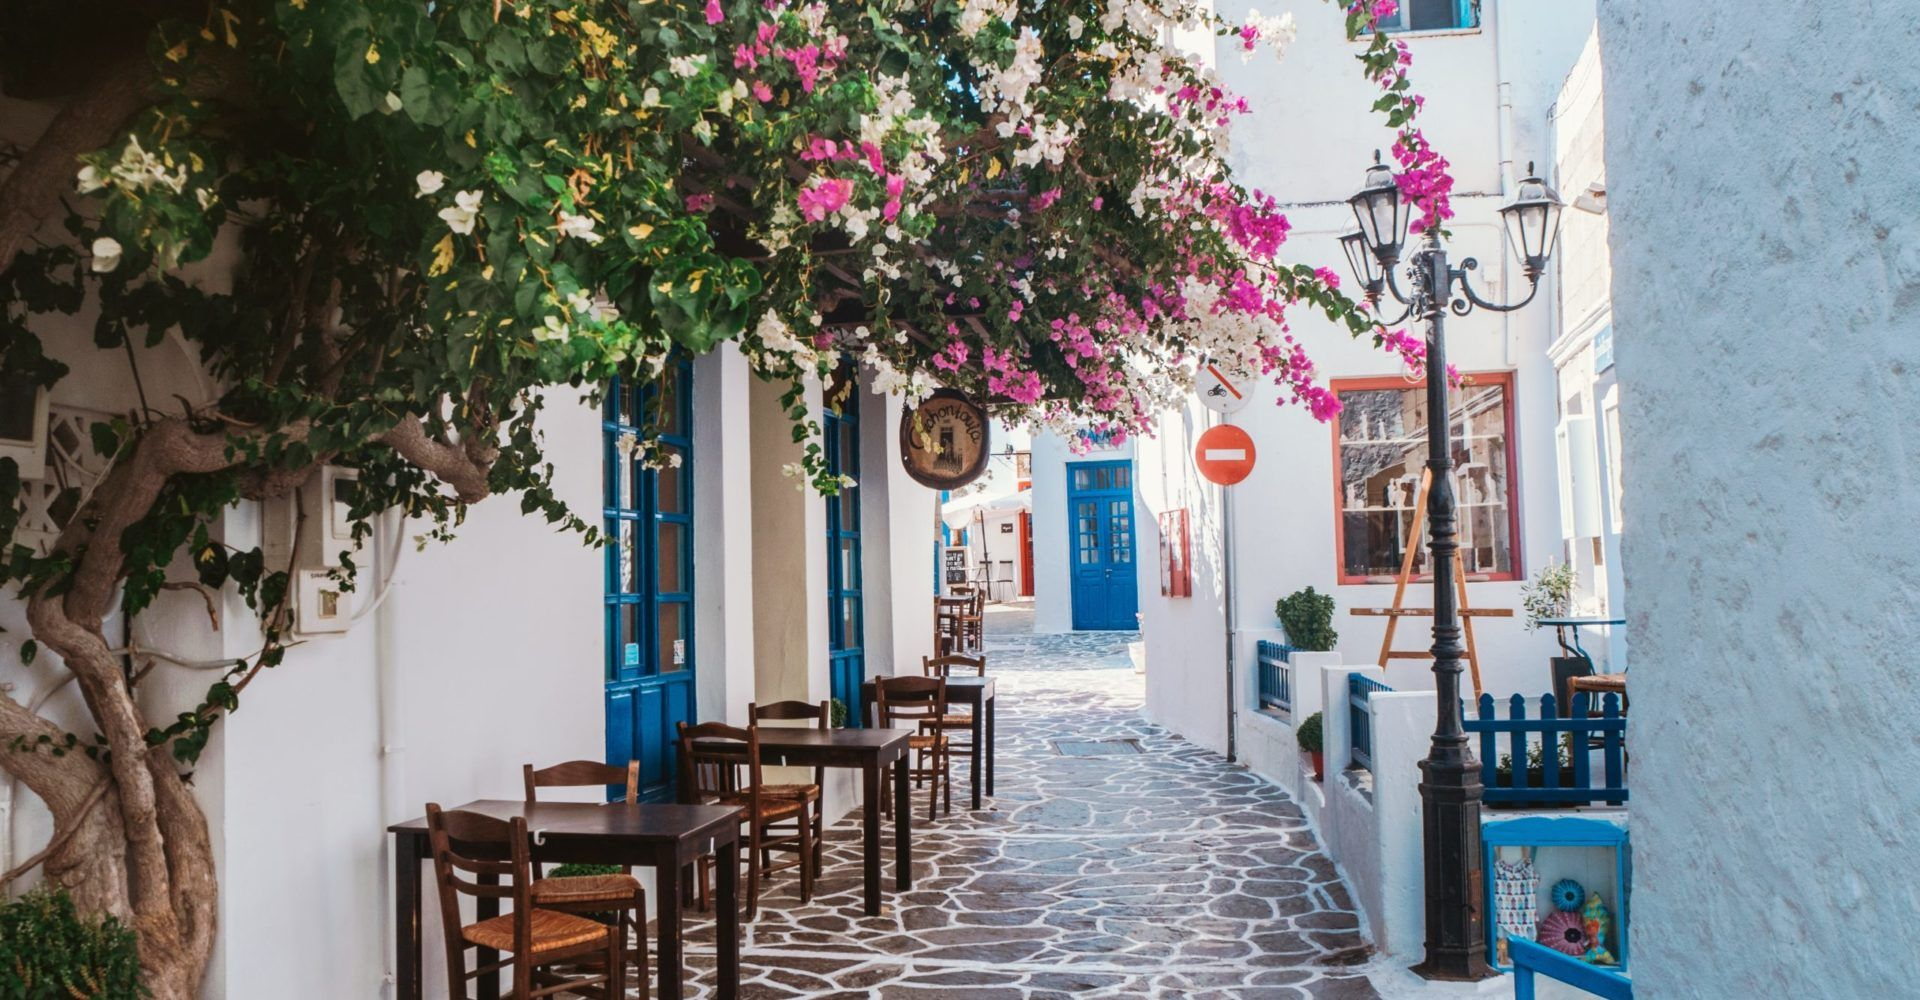 grecka uliczka